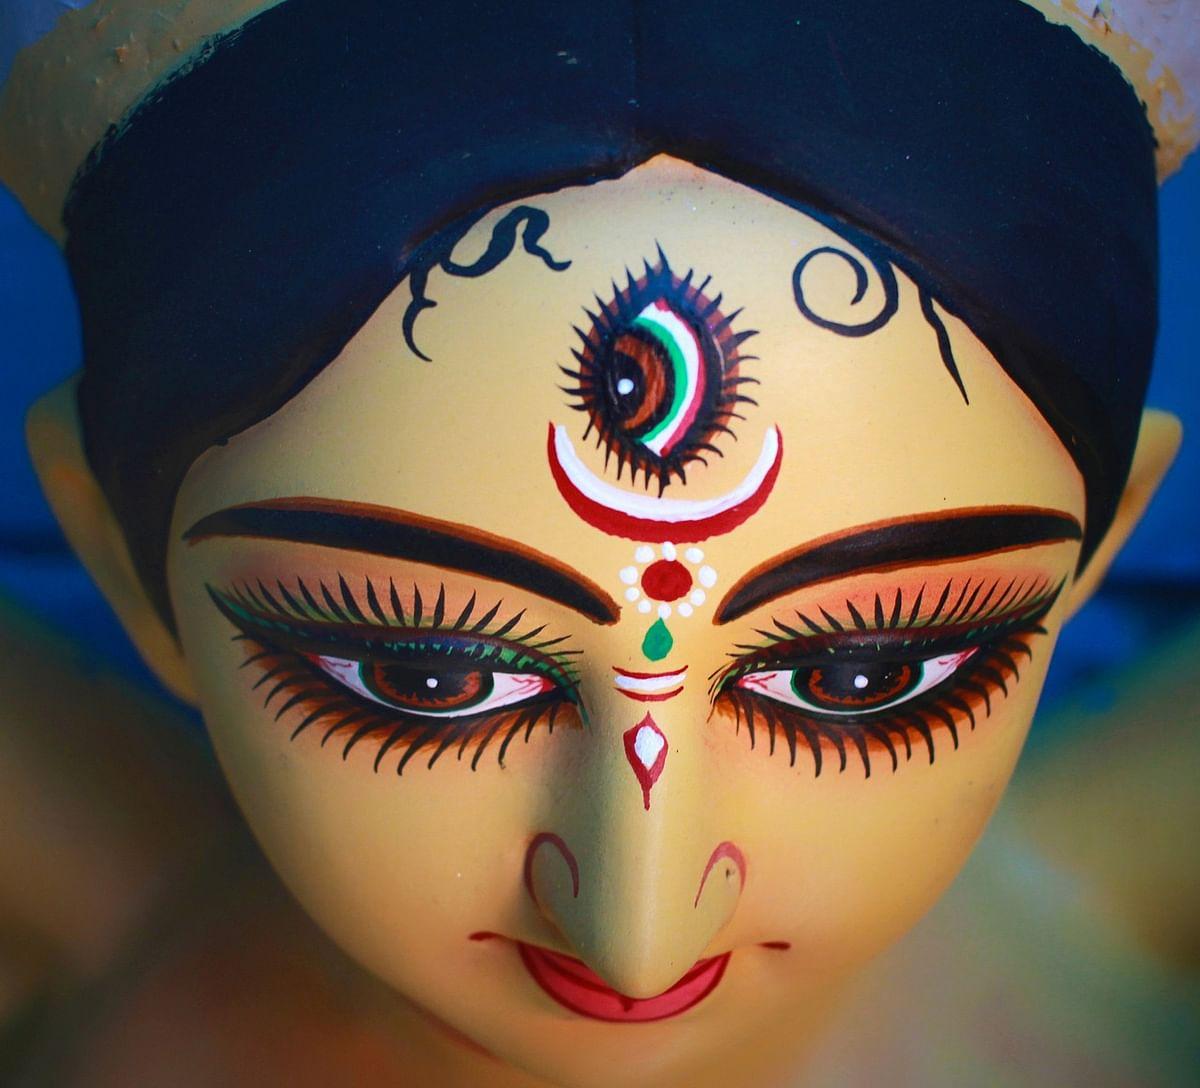 अहोई अष्टमी व्रत विधि - Ahoi ashtami Vrat Vidhi